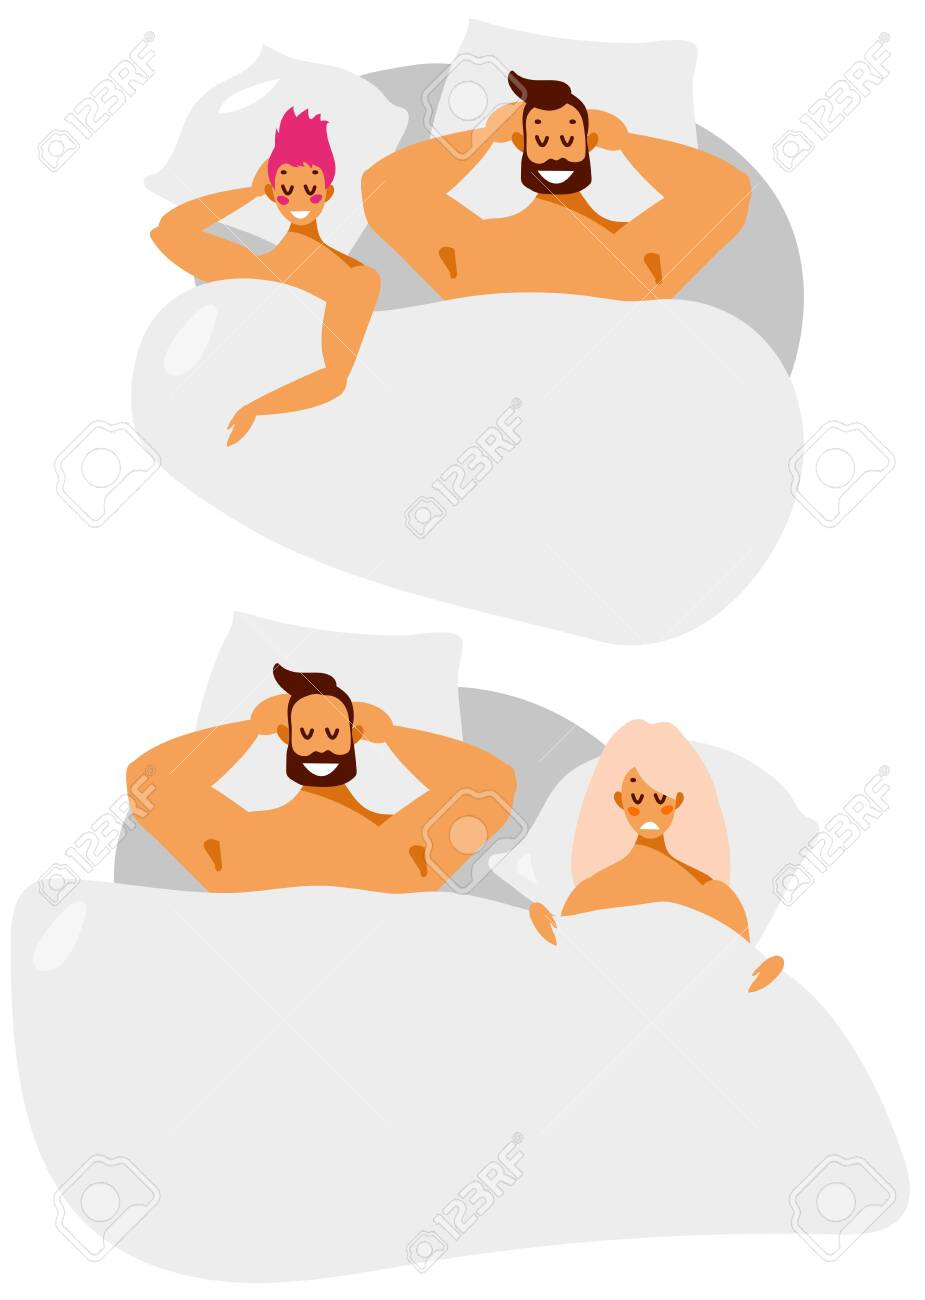 Sex mann mann cartoons auf